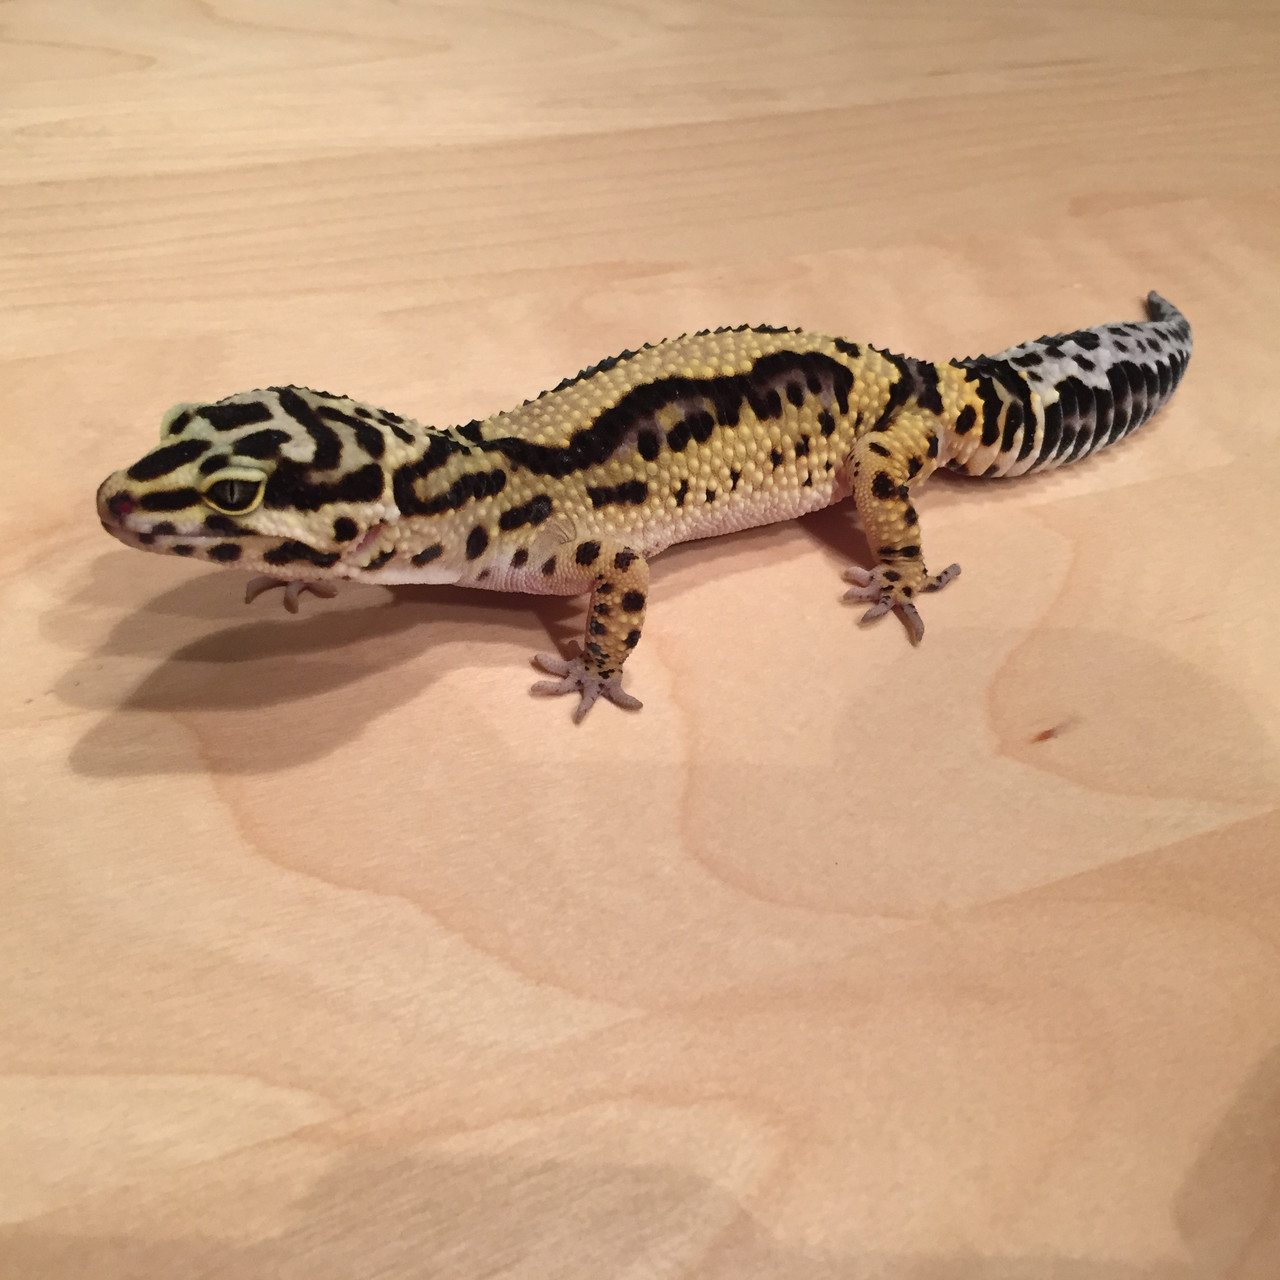 6 Monate alt: Leopardgecko 'Love' Tangerine Bold Stripe (Aufnahmedatum: Februar 2015) Courtesy J.B.